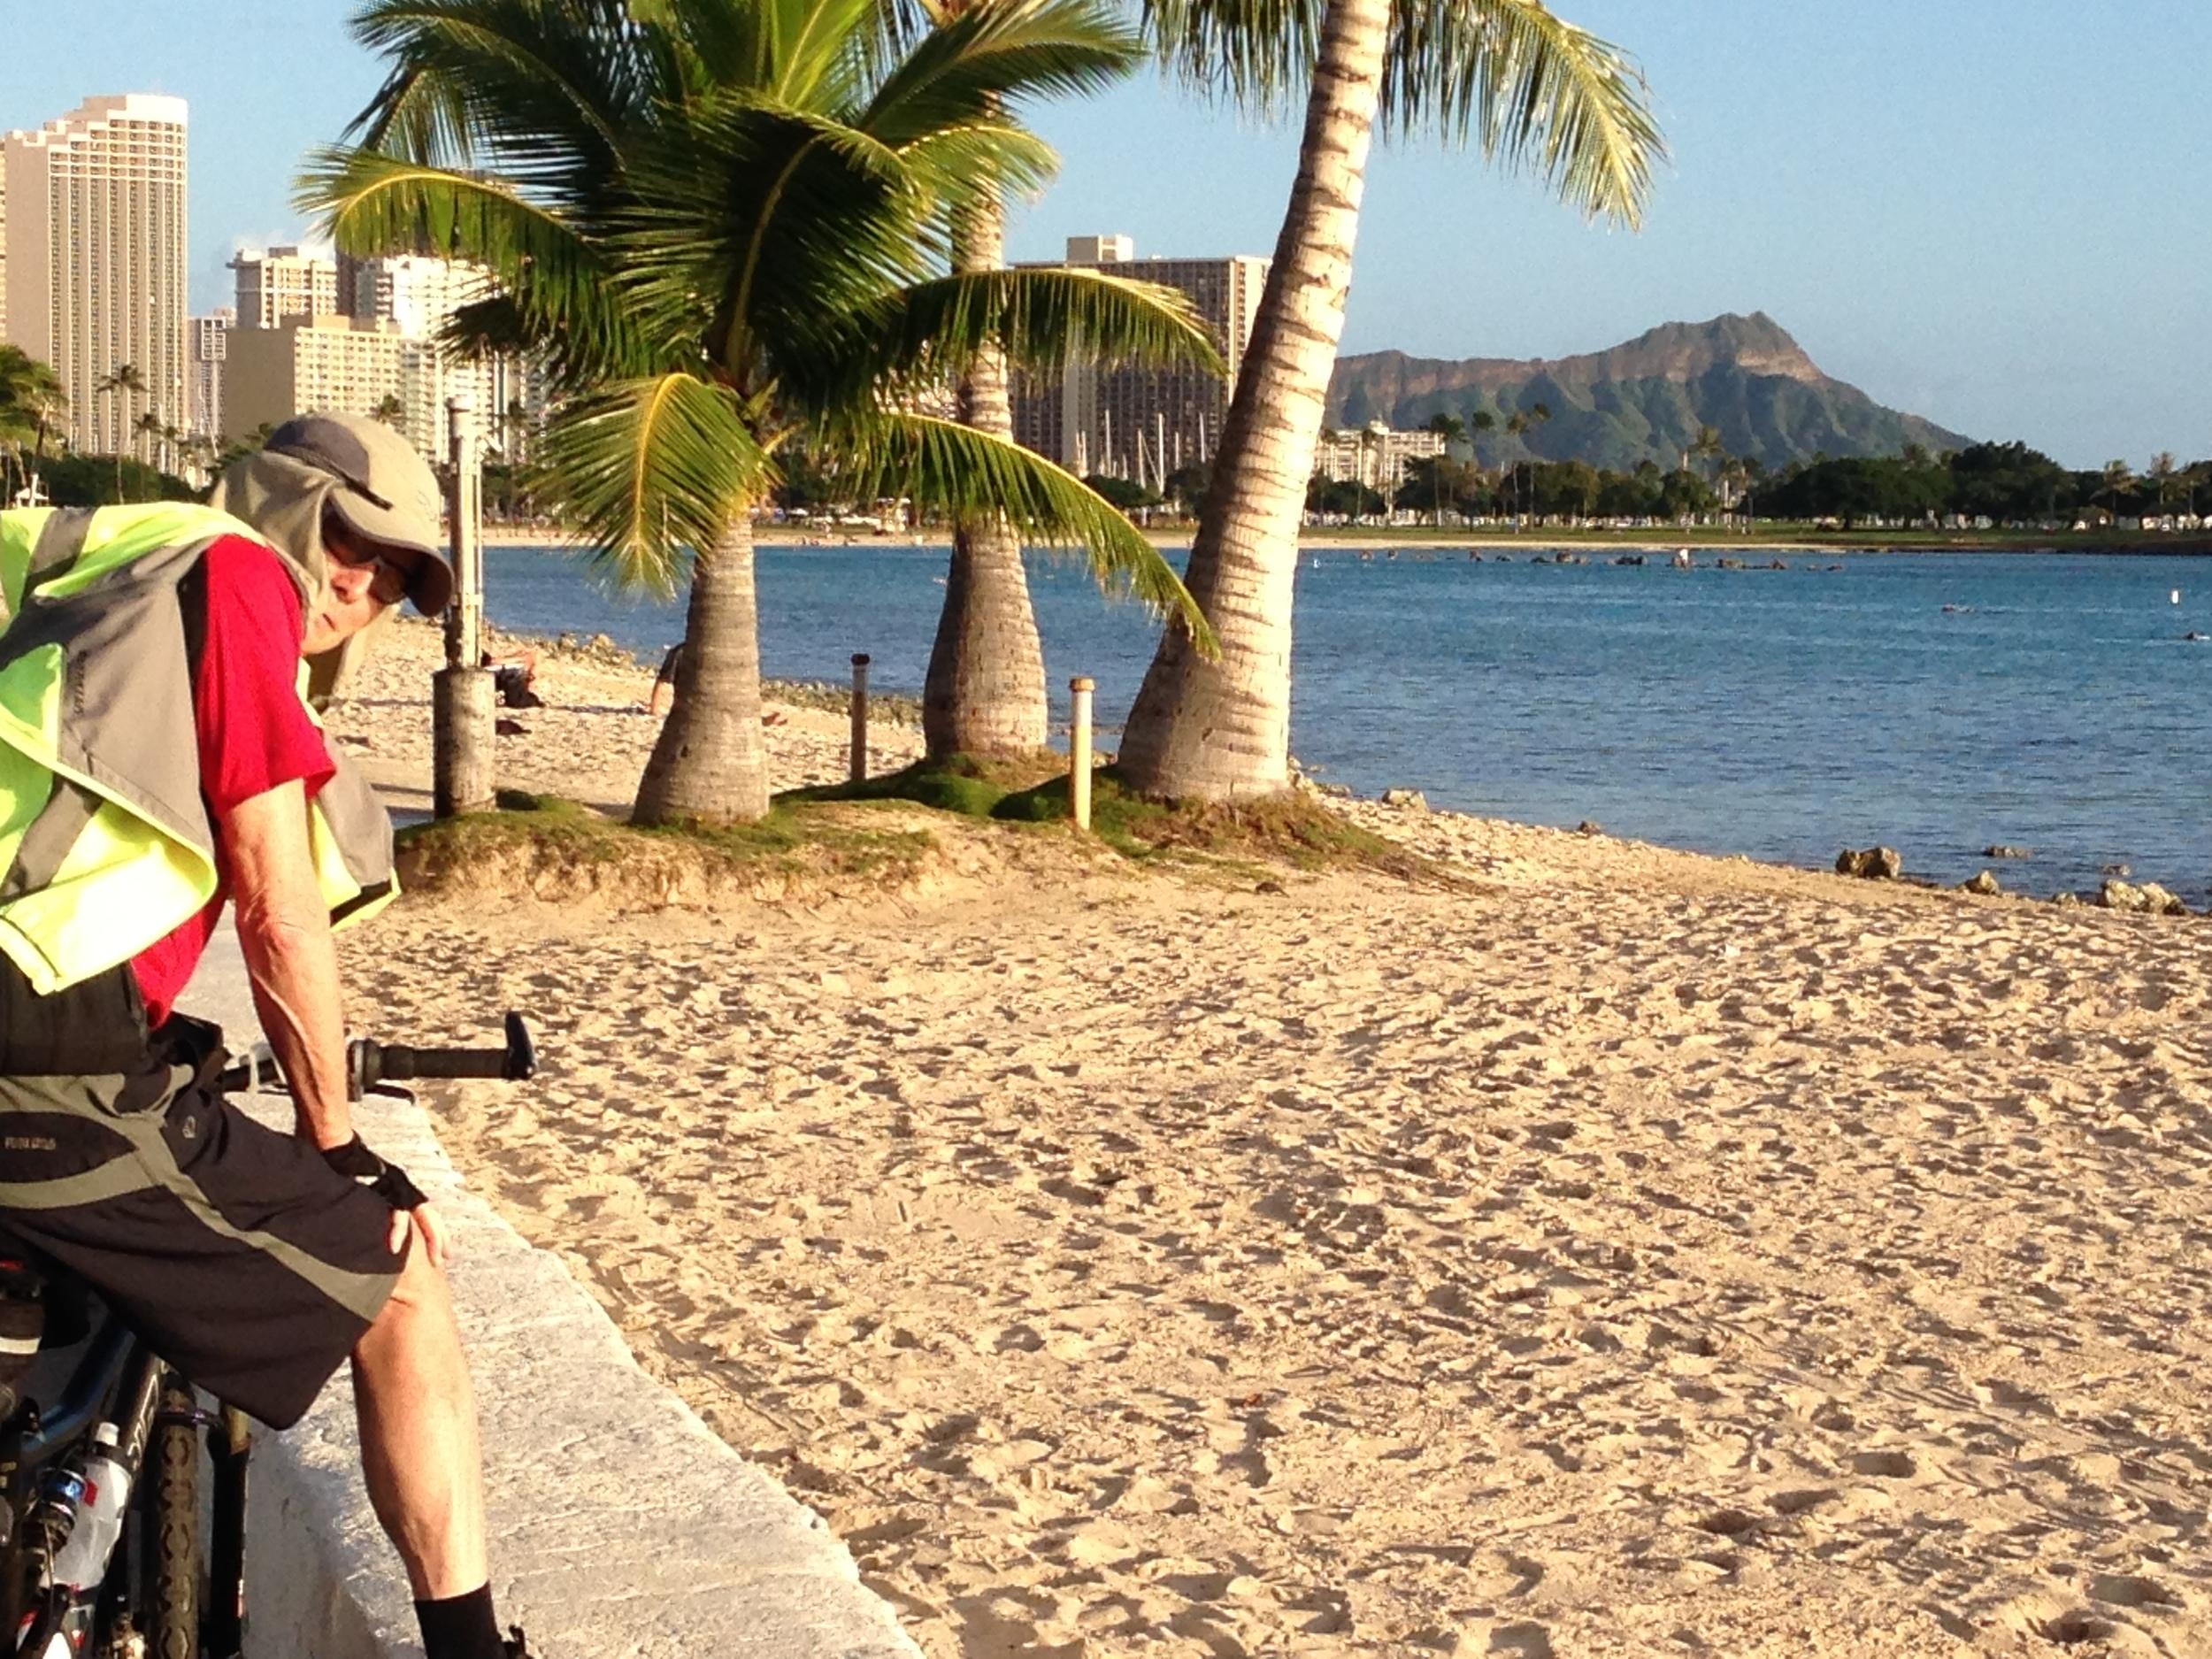 Jack riding his bike at his favorite neighborhood park, Ala Moana Beach Park.